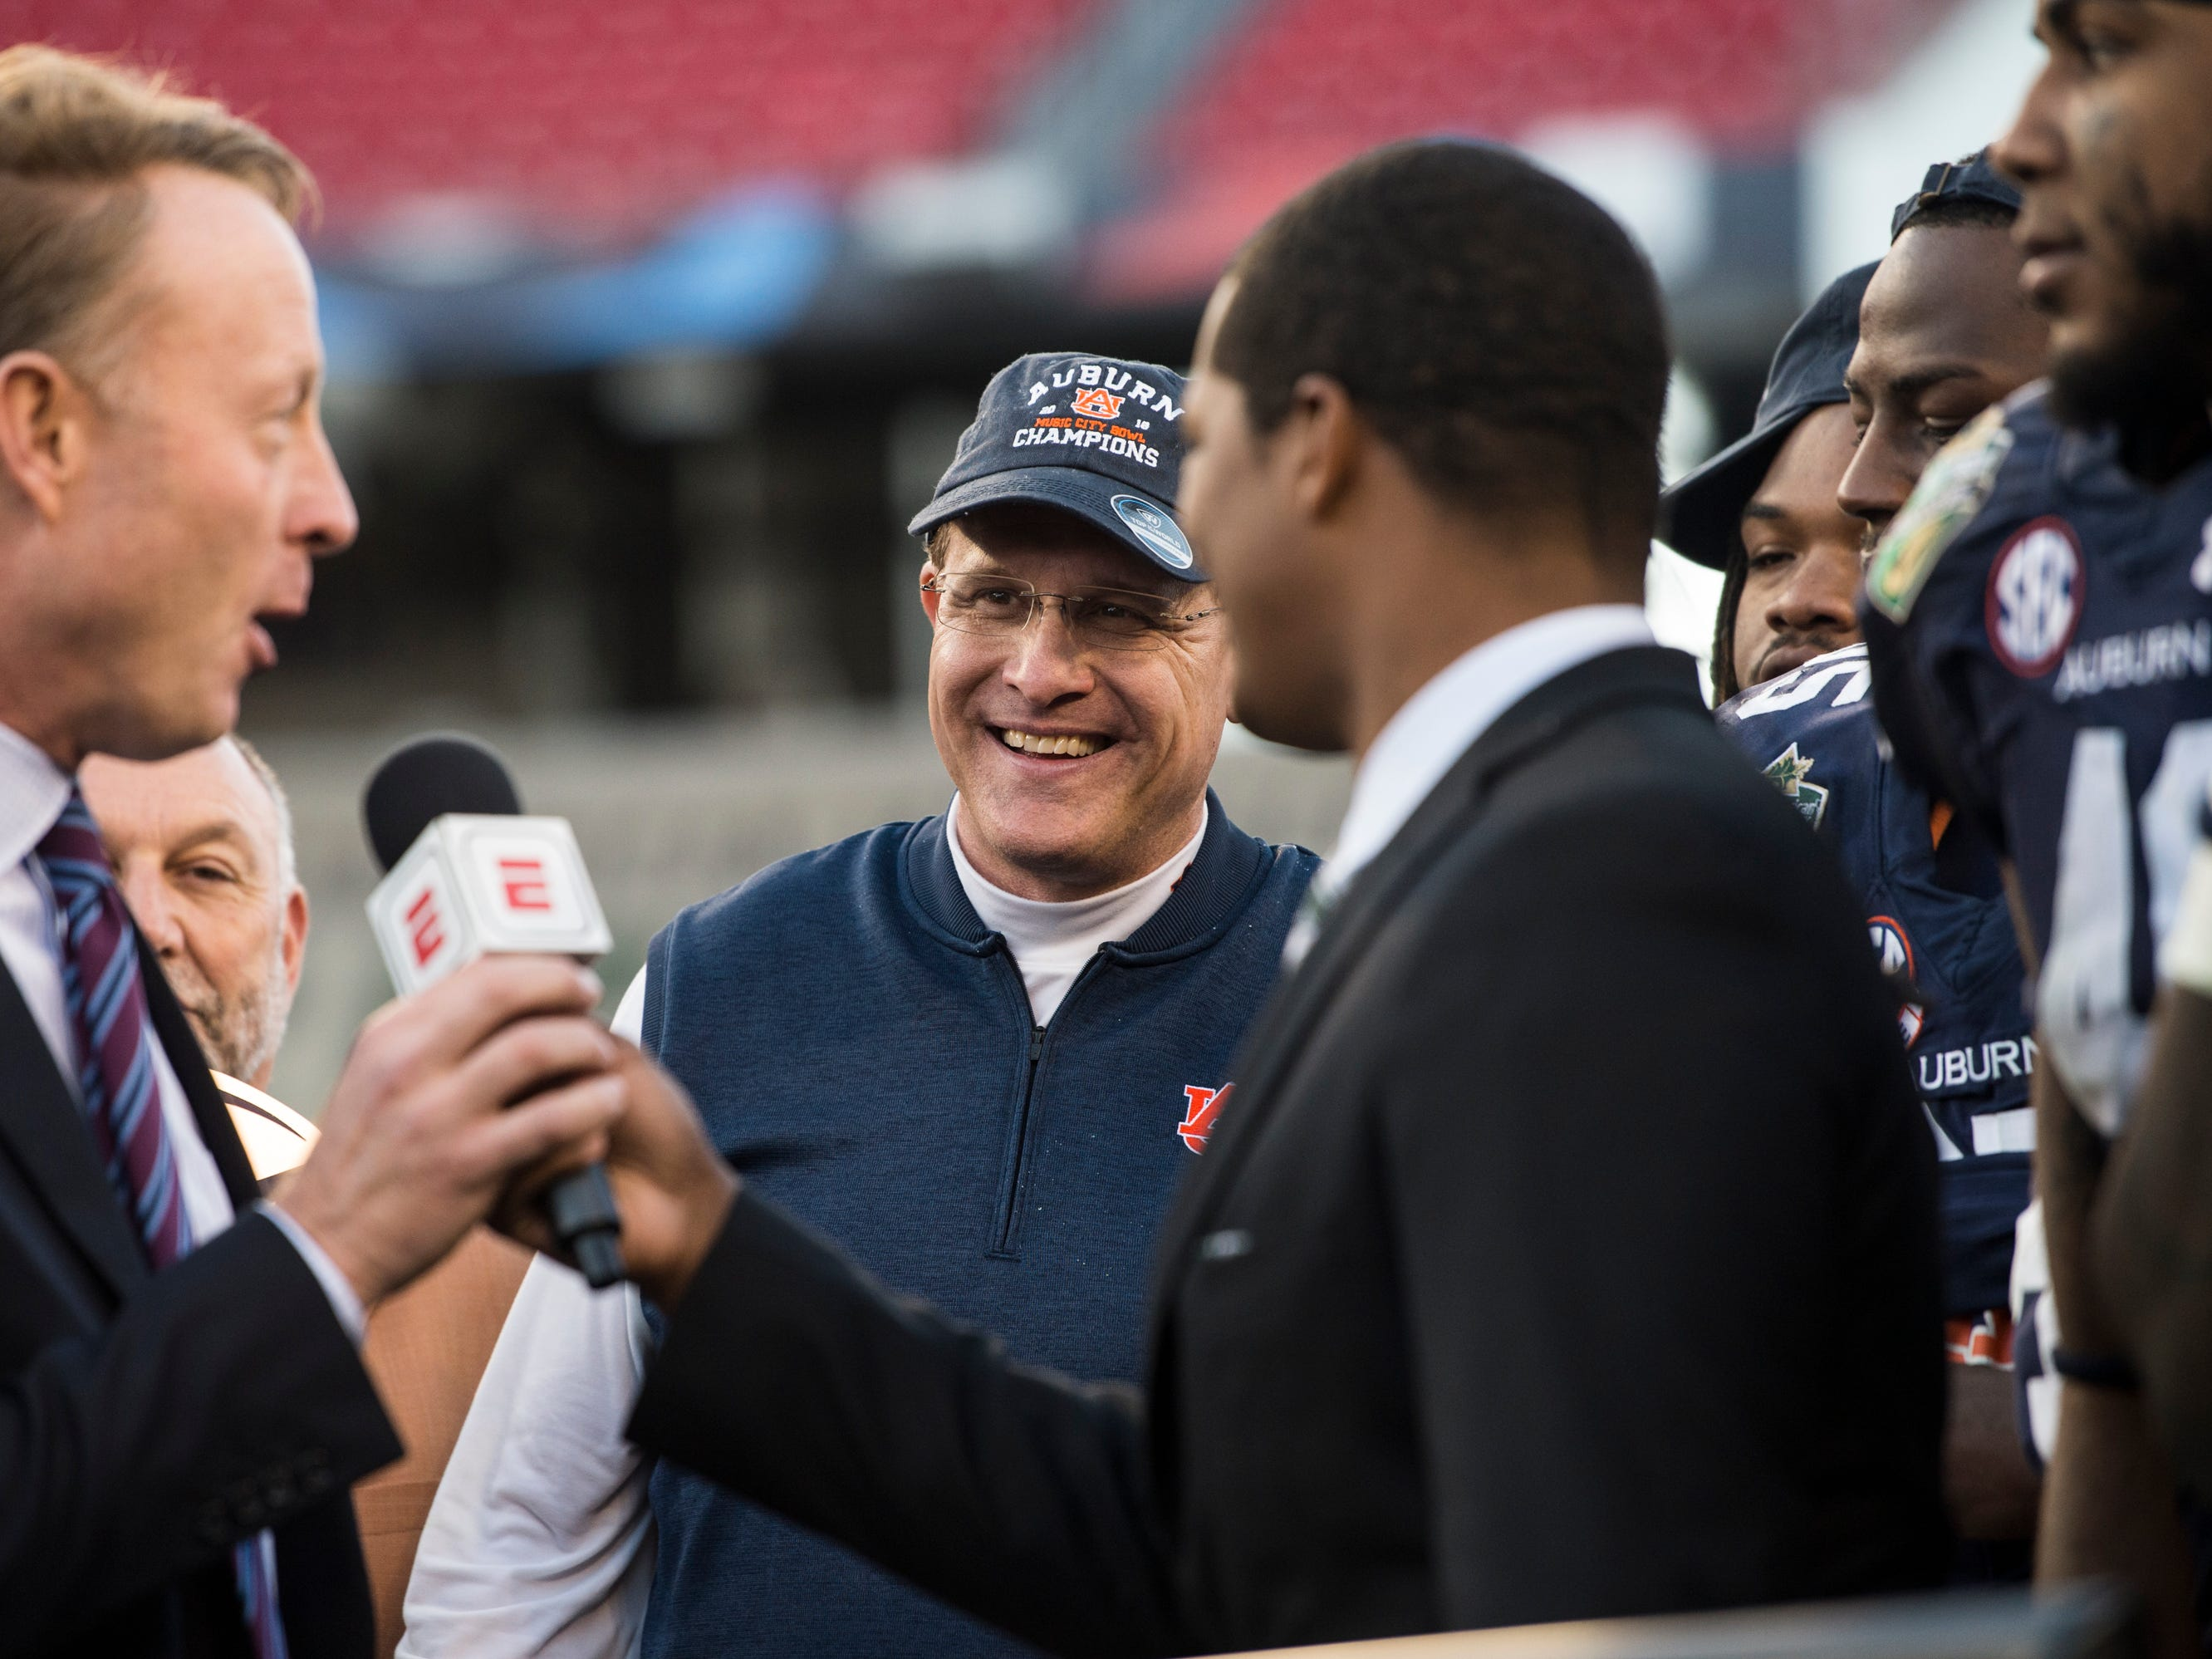 Auburn head coach Gus Malzahn smiles as his team is awarded the trophy after winning the Music City Bowl at Nissan Stadium in Nashville, Tenn., on Friday, Dec. 28, 2018. Auburn defeated Purdue 63-14.